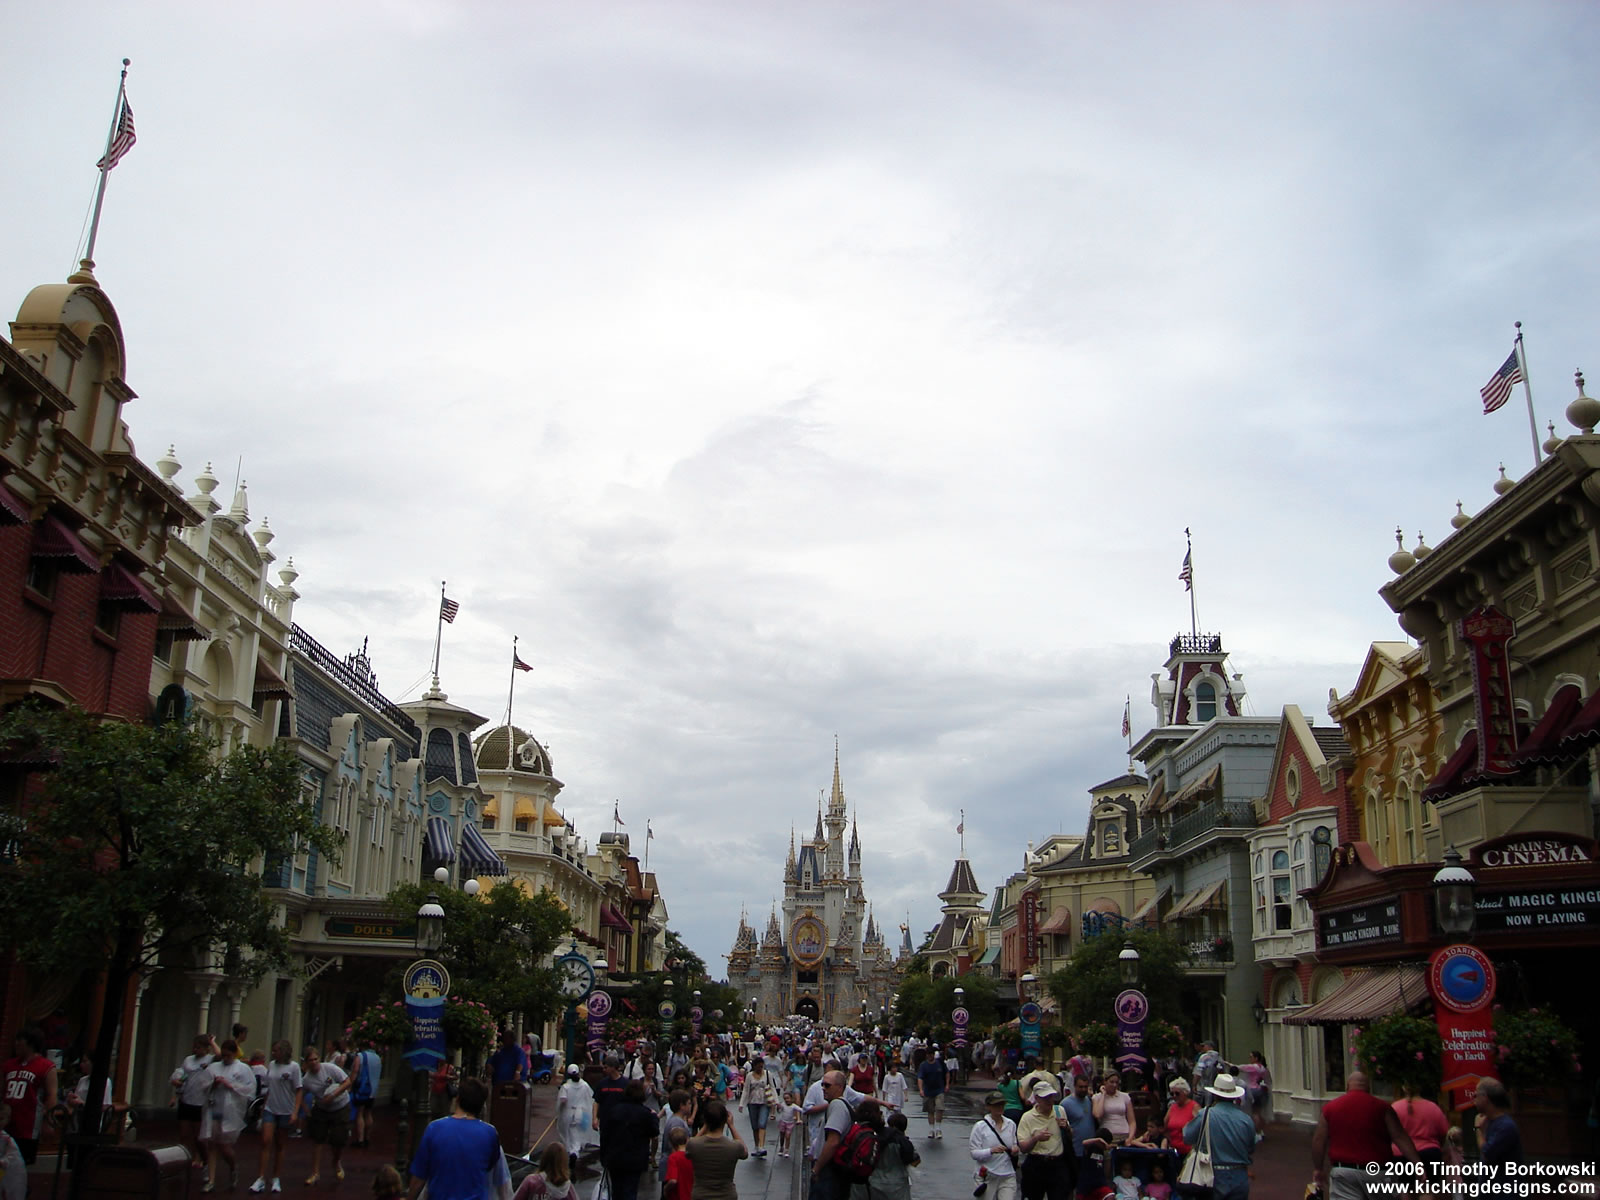 magic kingdom 05 magic kingdom 04 magic kingdom 03 1600x1200